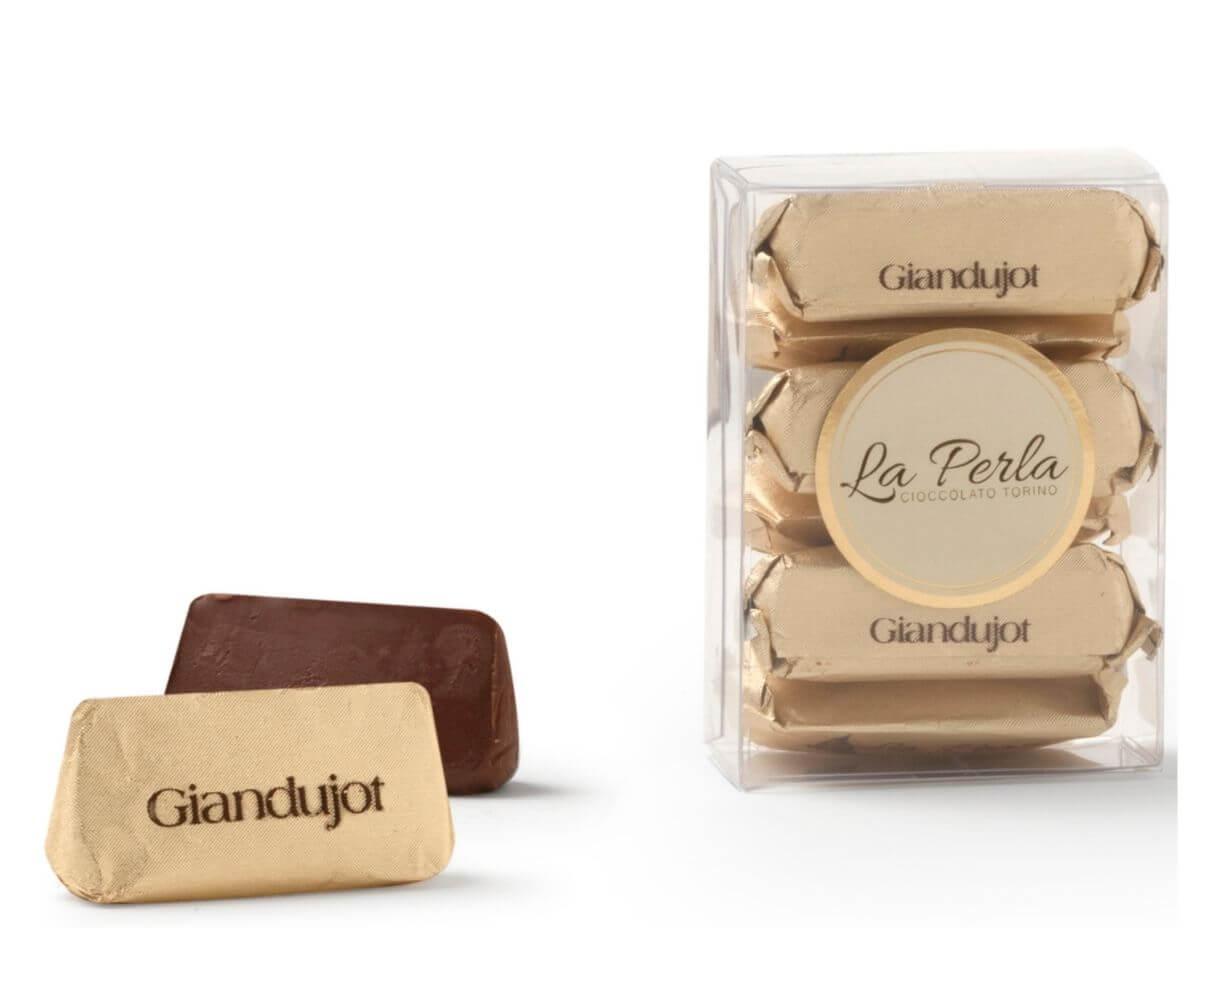 Cioccolatini gianduiotti giandujot La perla 55gr